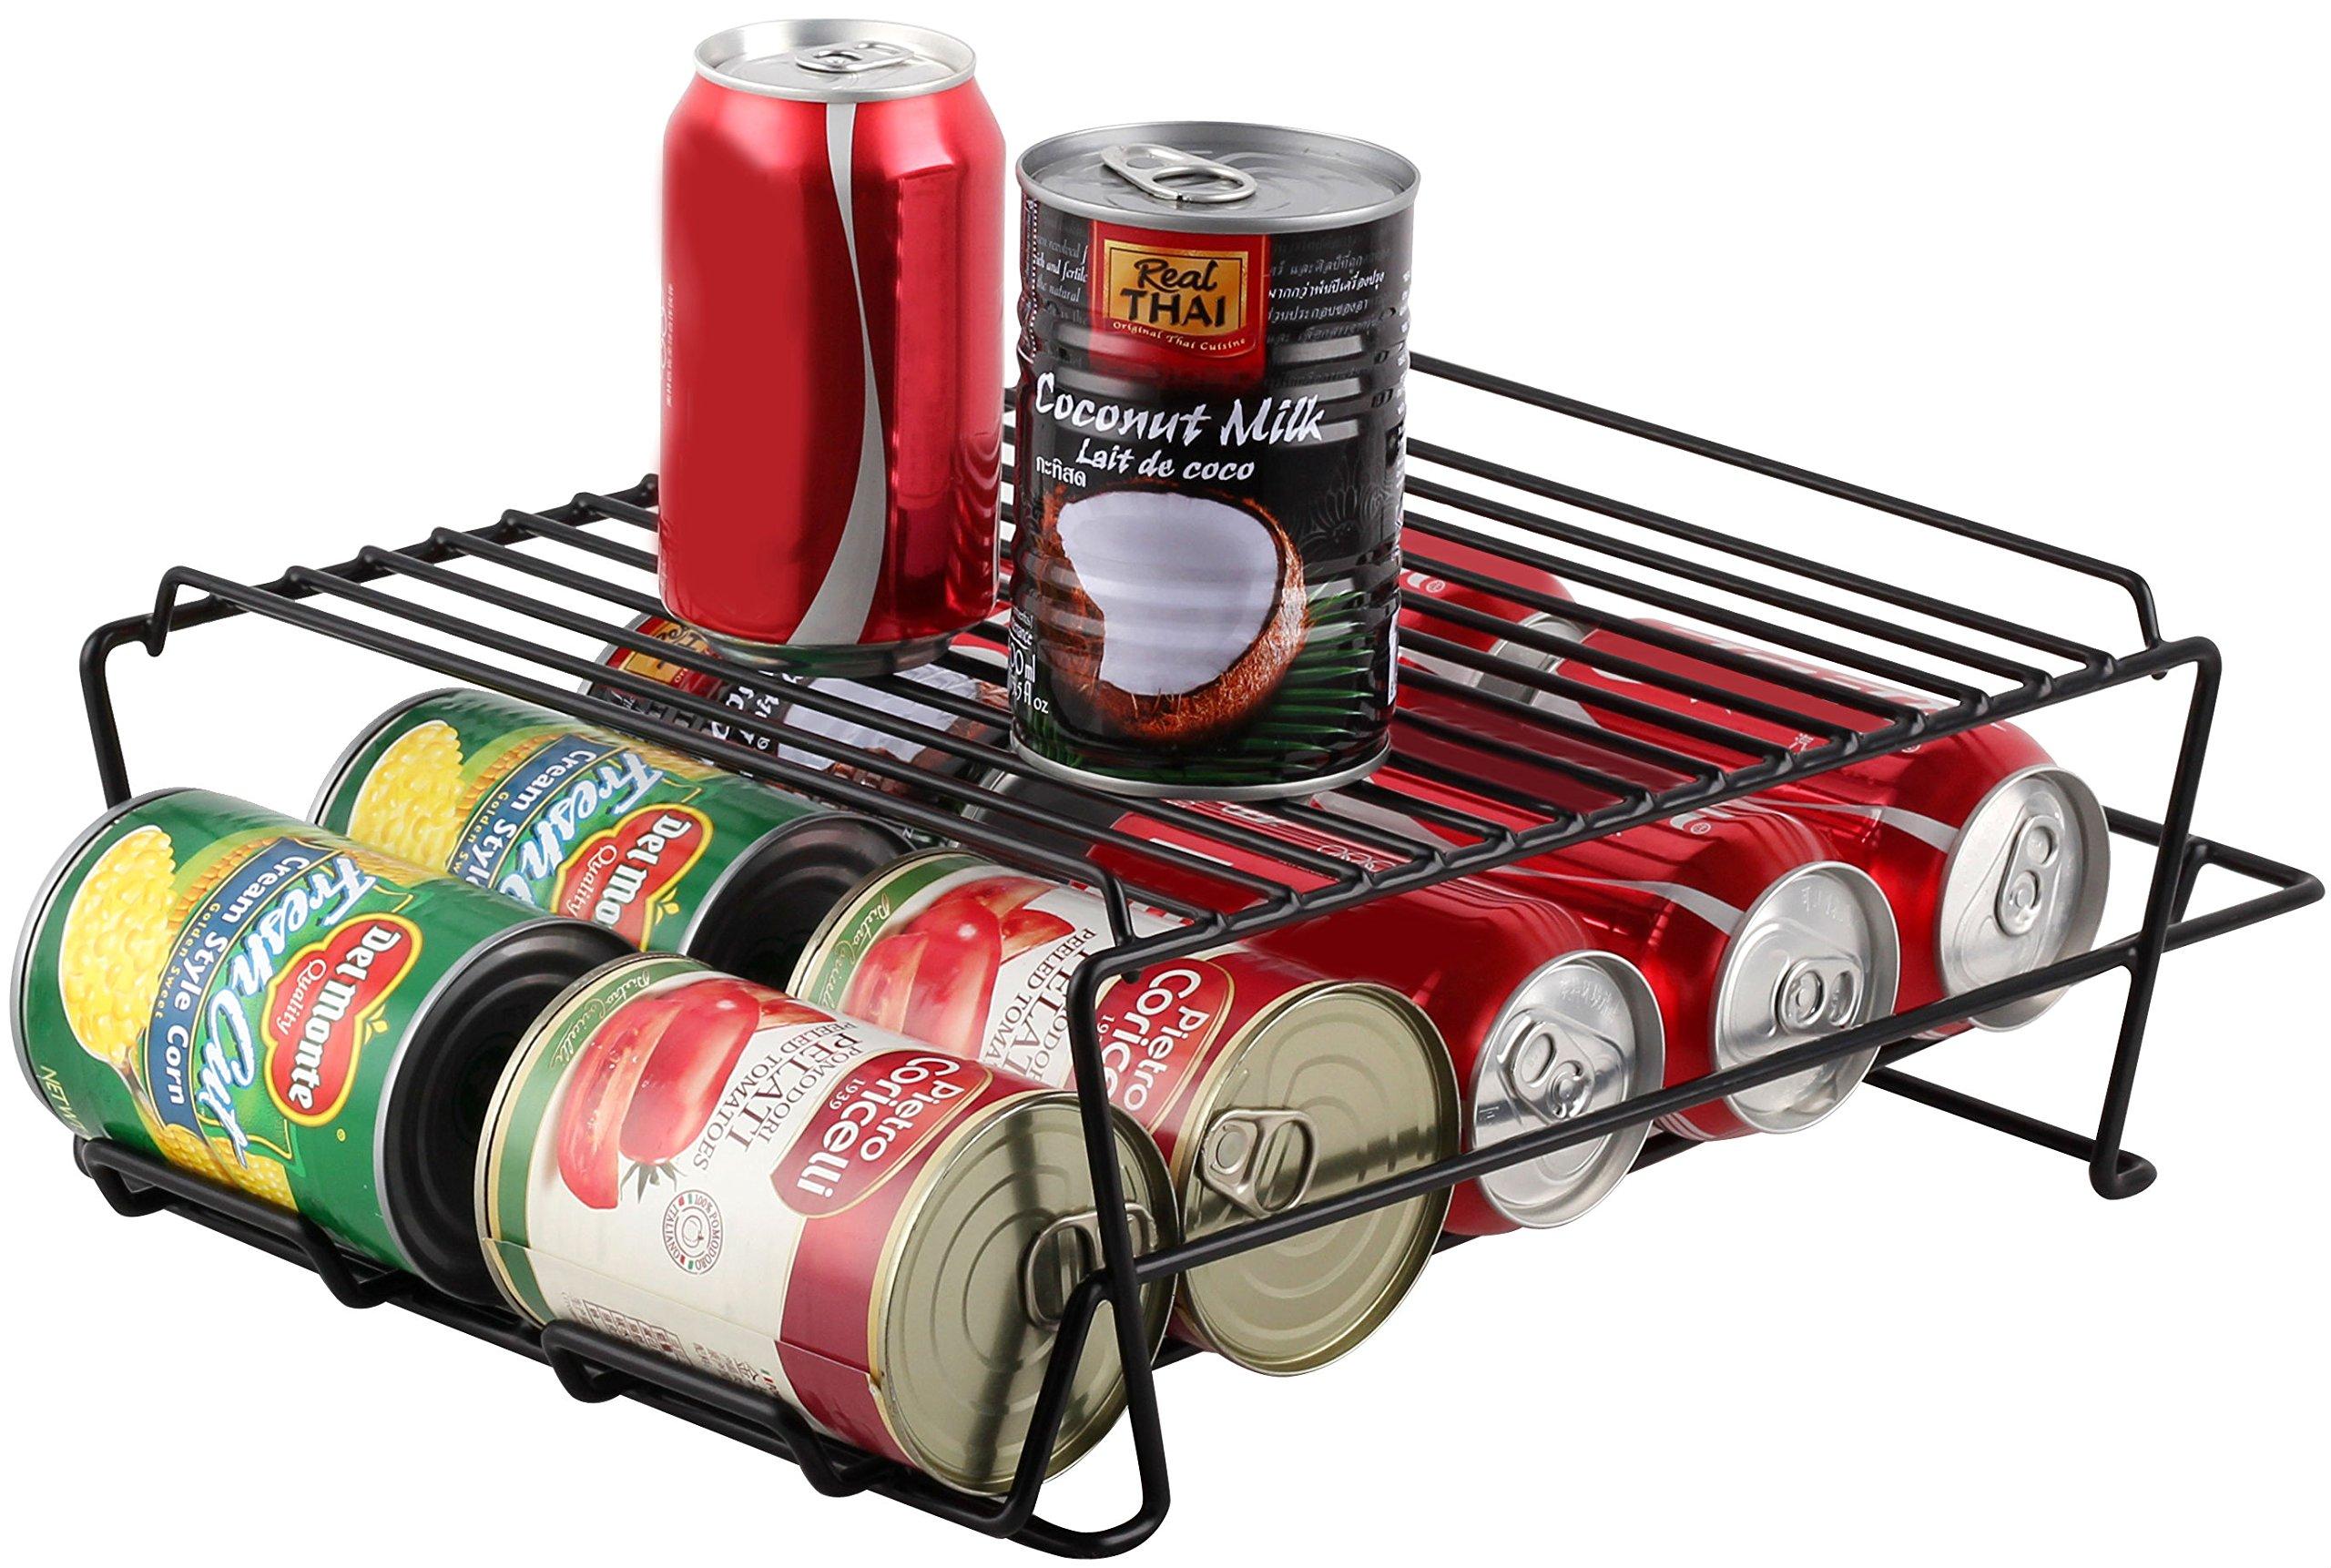 Stylish Sturdy Steel Can Beverage Dispenser Rack Organizer, Black (Dispenser ++)